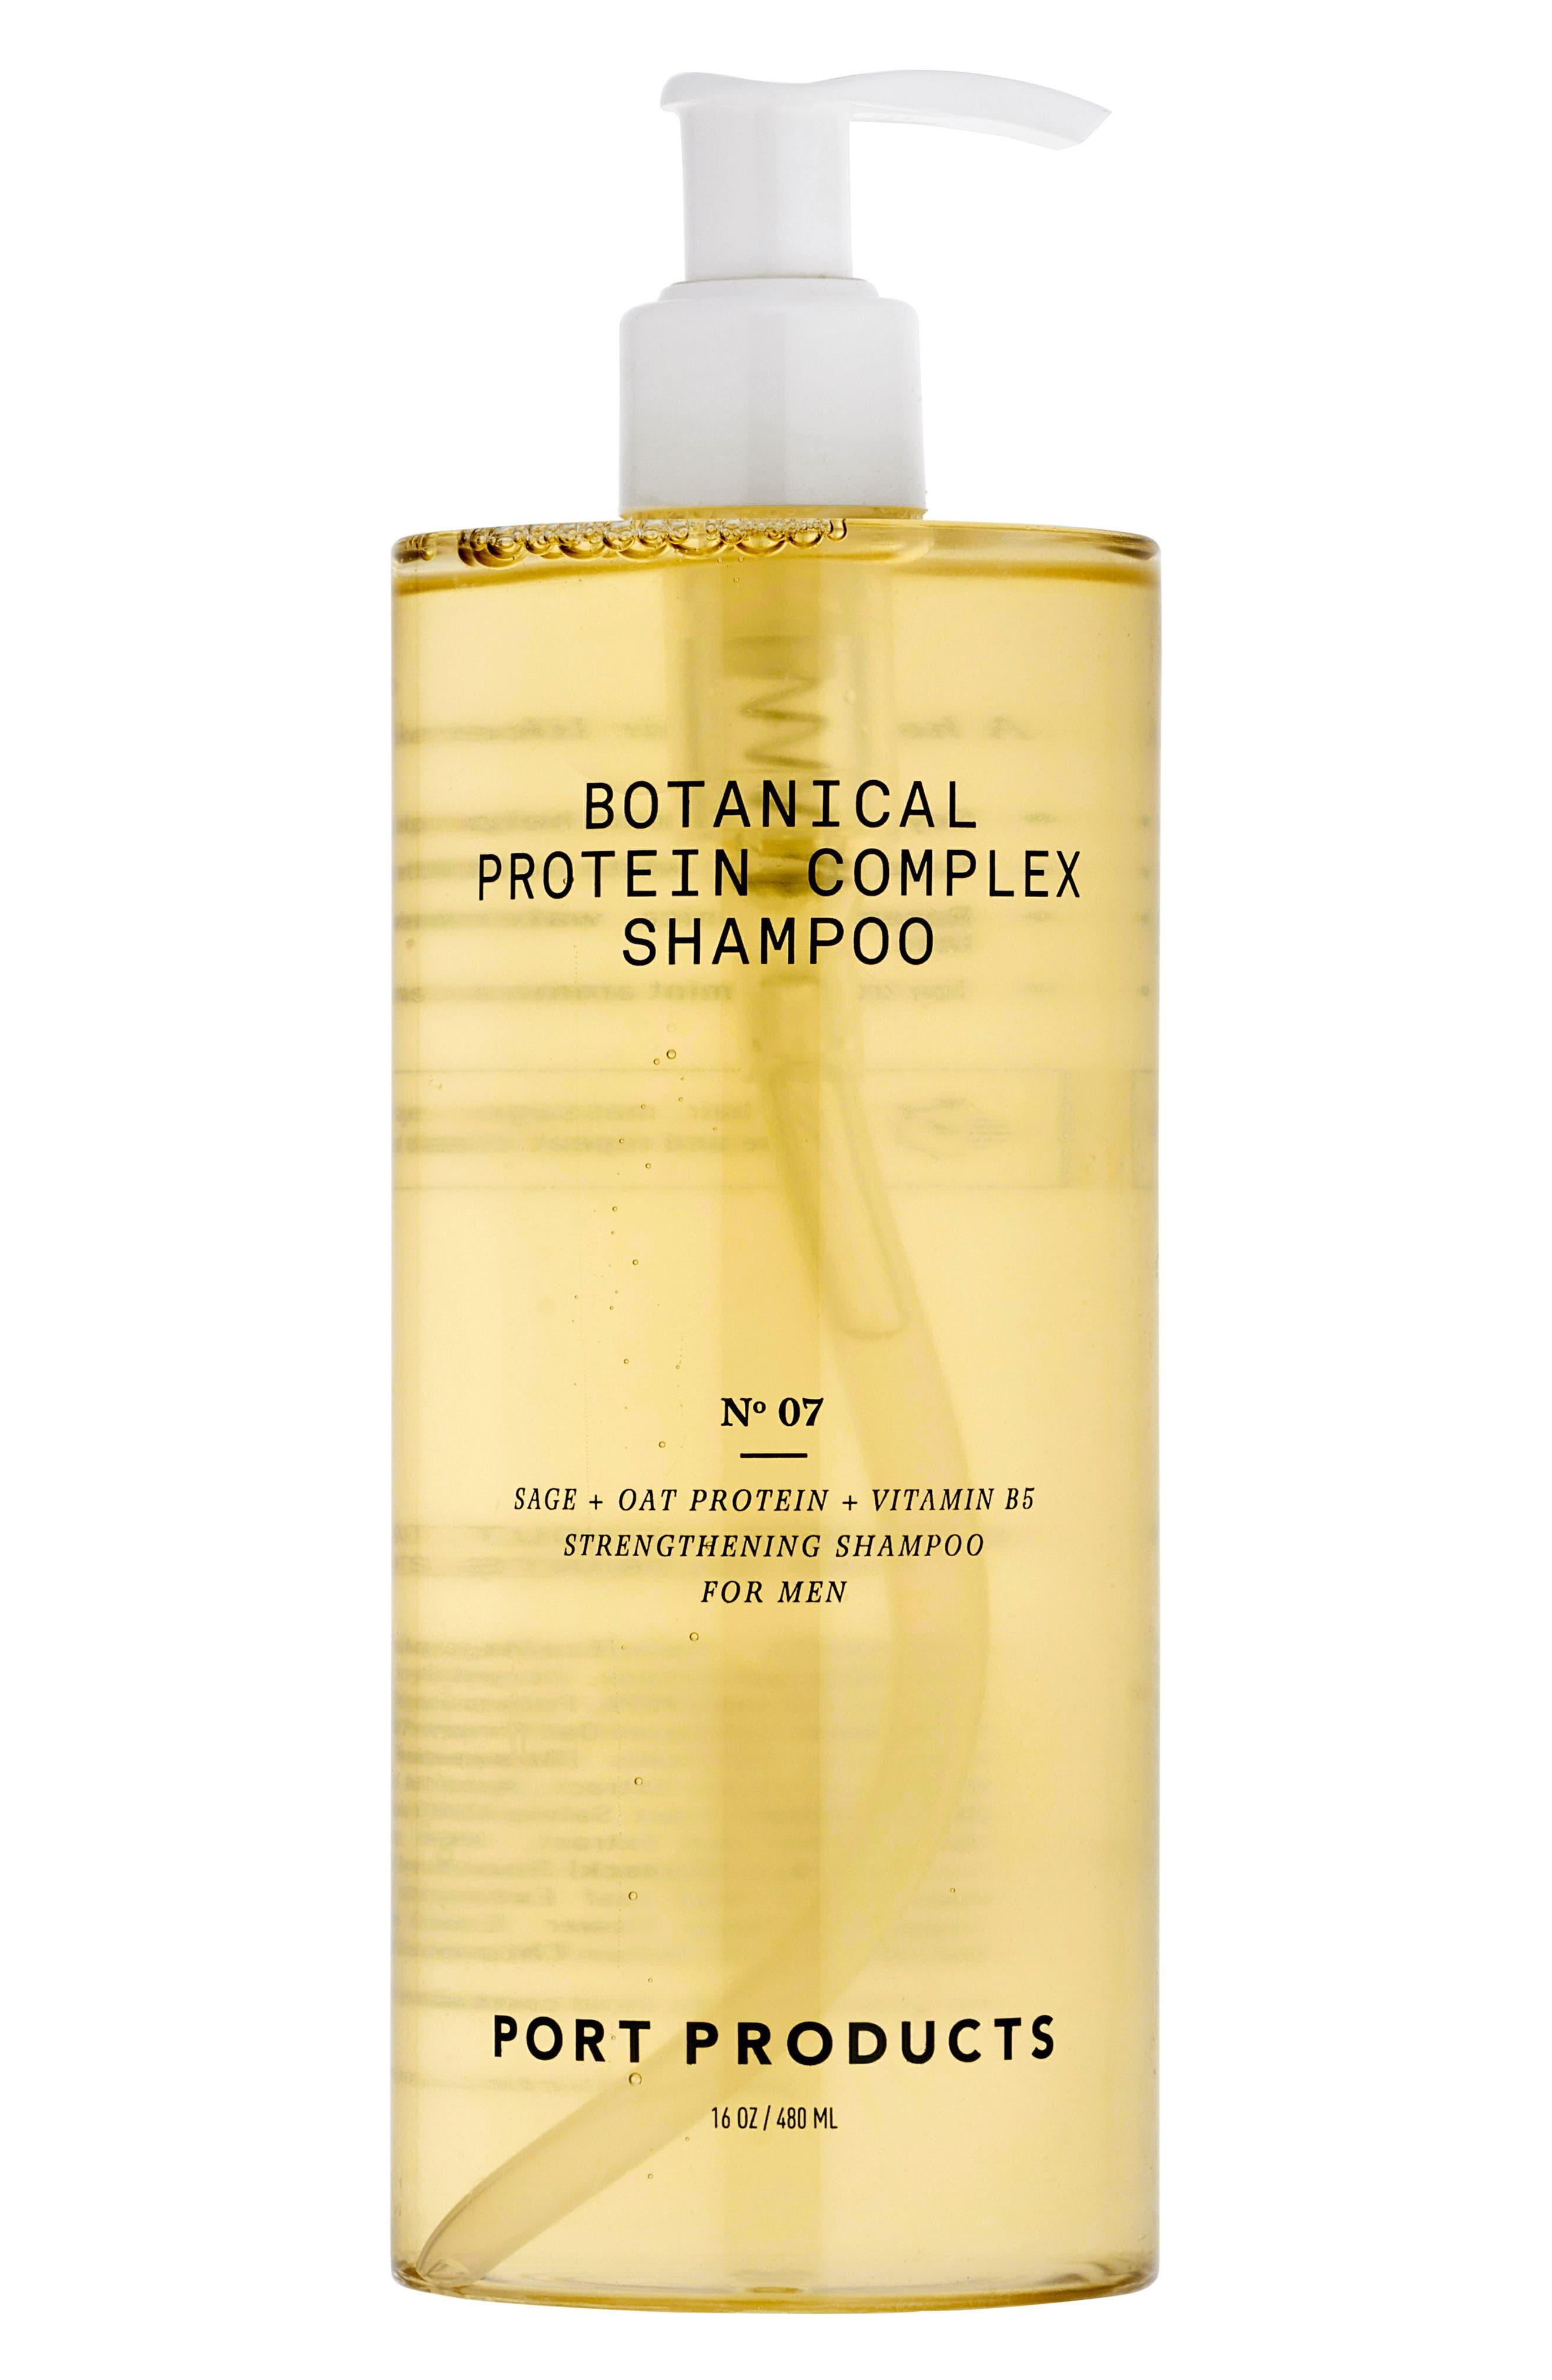 Botanical Protein Complex Shampoo,                             Main thumbnail 1, color,                             No Color